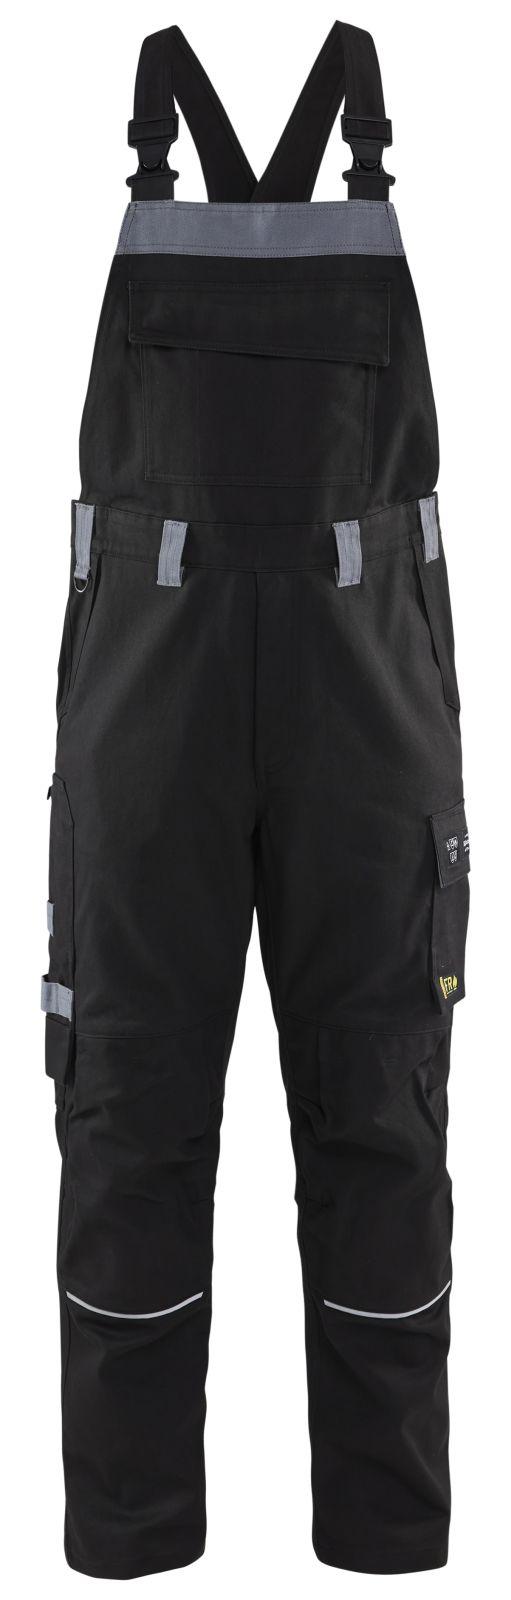 Blaklader Amerikaanse overalls 28611516 Vlamvertragend zwart-grijs(9994)